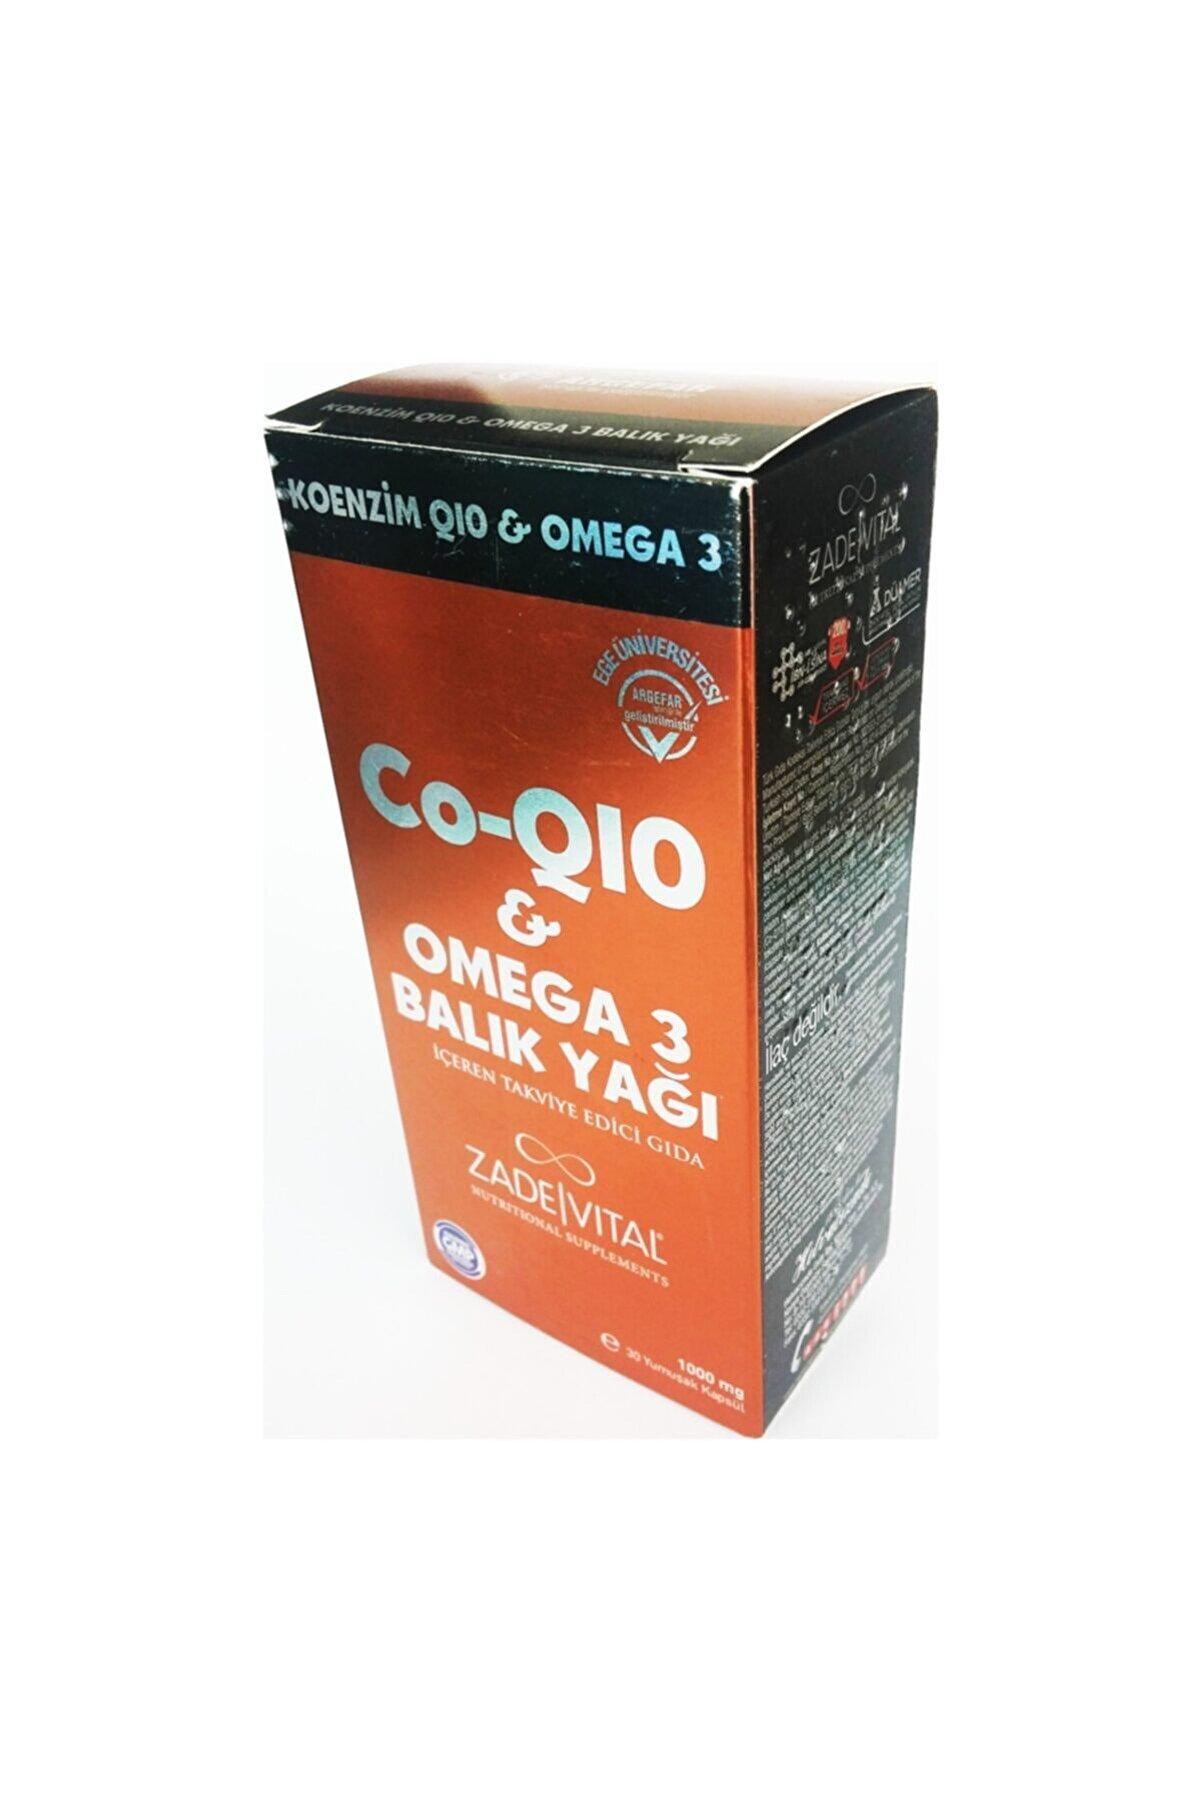 Zade Vital Co-q10 Omega 3 Balık Yağı Blister 30 Kapsül